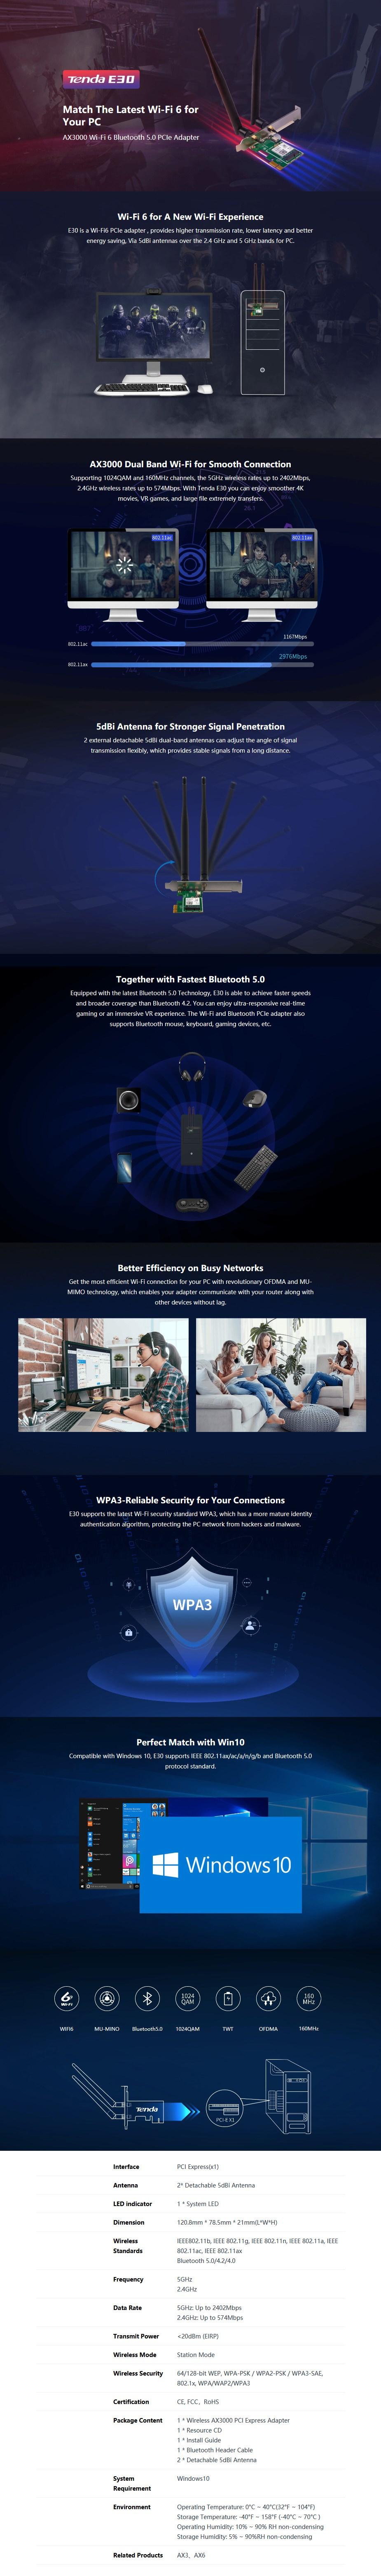 Tenda E30 AX3000 Wi-Fi Bluetooth 5.0 PCIe Adapter - Overview 1